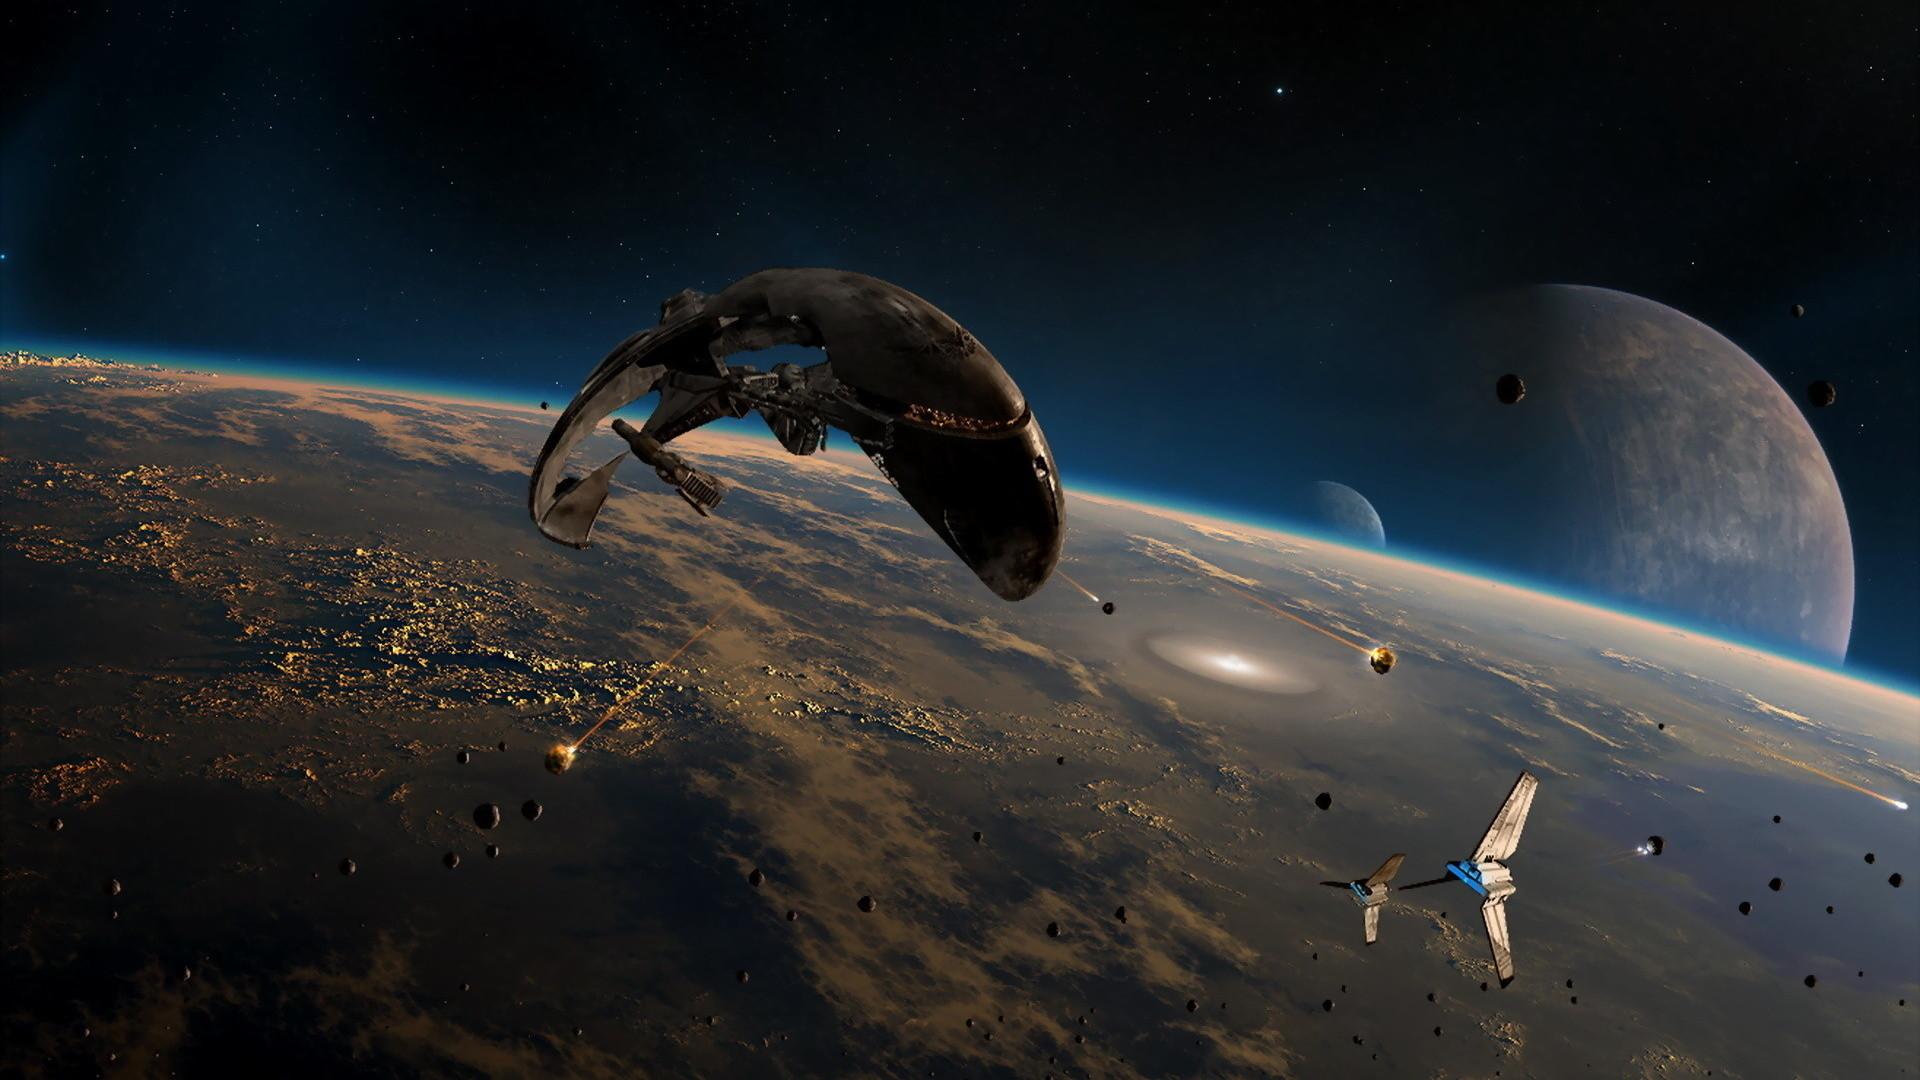 High Resolution Amazing Fantasy Sci Fi Space Wallpaper HD 2 Full .